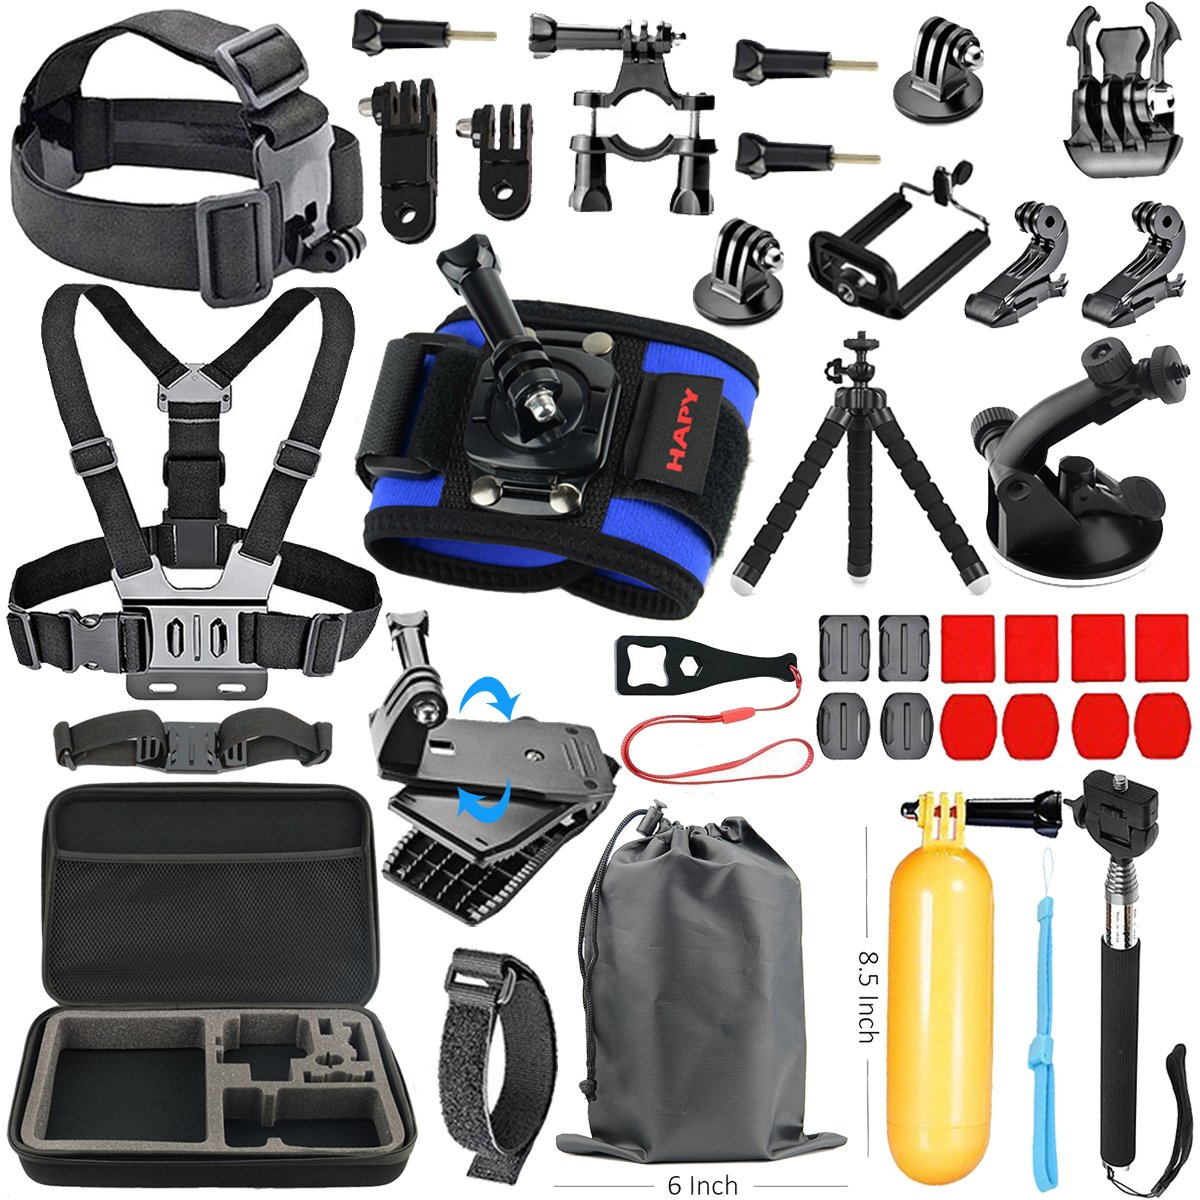 HAPY Sports Action Professional Video Camera Accessory Kit for GoPro Hero6,5 Black, Hero Session,HERO (2018),HERO 6,5,4,3,3+, GoPro Fusion,SJCAM,AKASO,Xiaomi,DBPOWER,Camera Kit